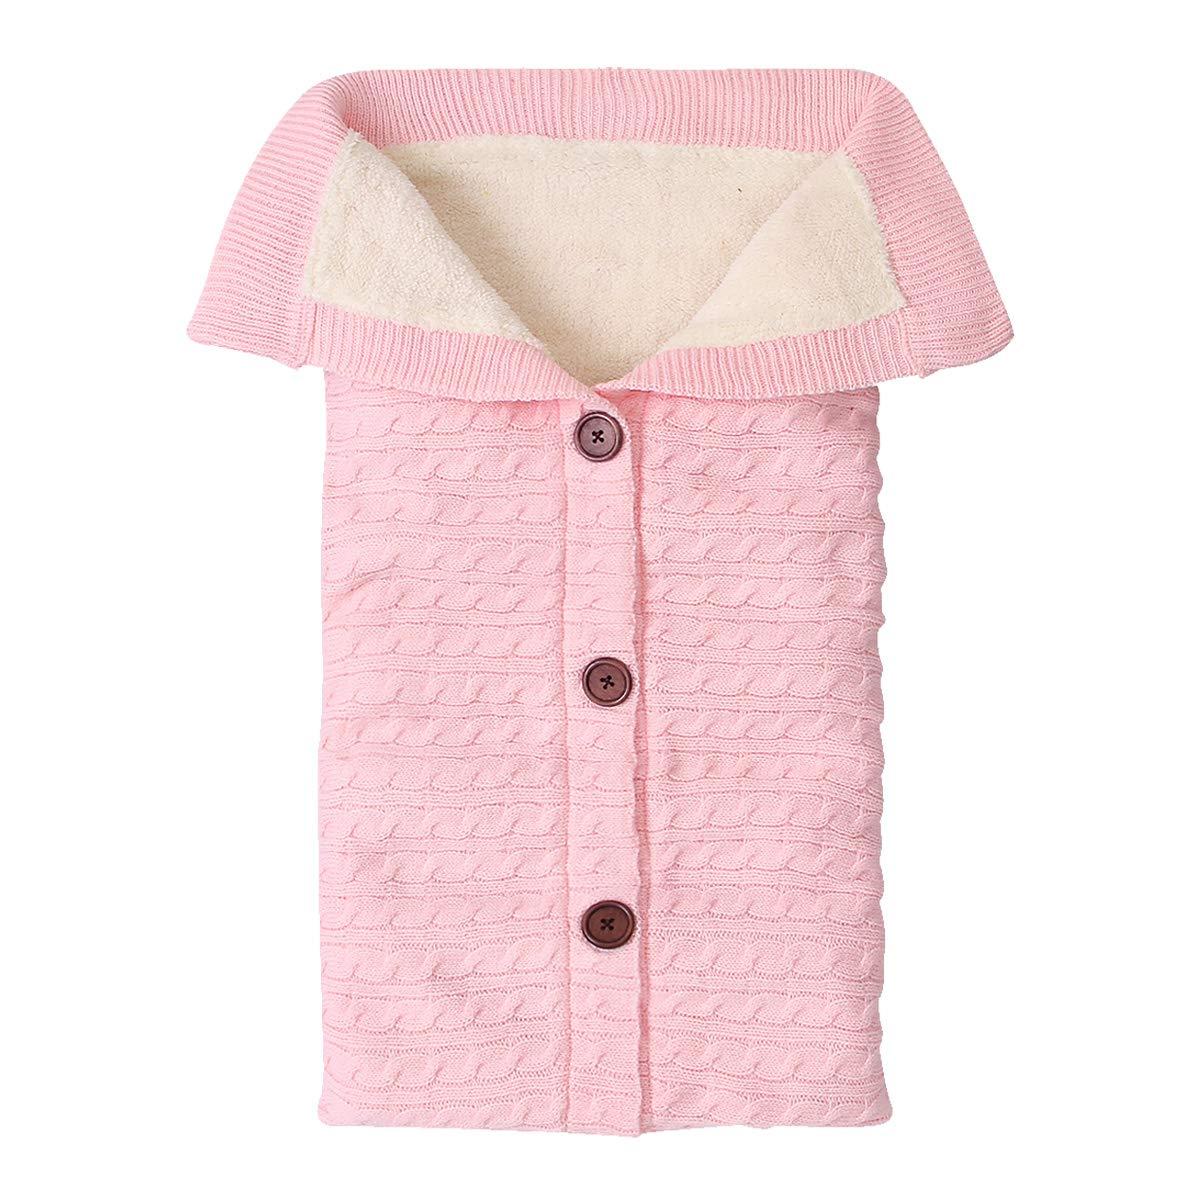 OhhGo Unisex Infant Swaddle Blanket Warm Knit Sleep Sack Stroller Wrap for Baby Girls Boys